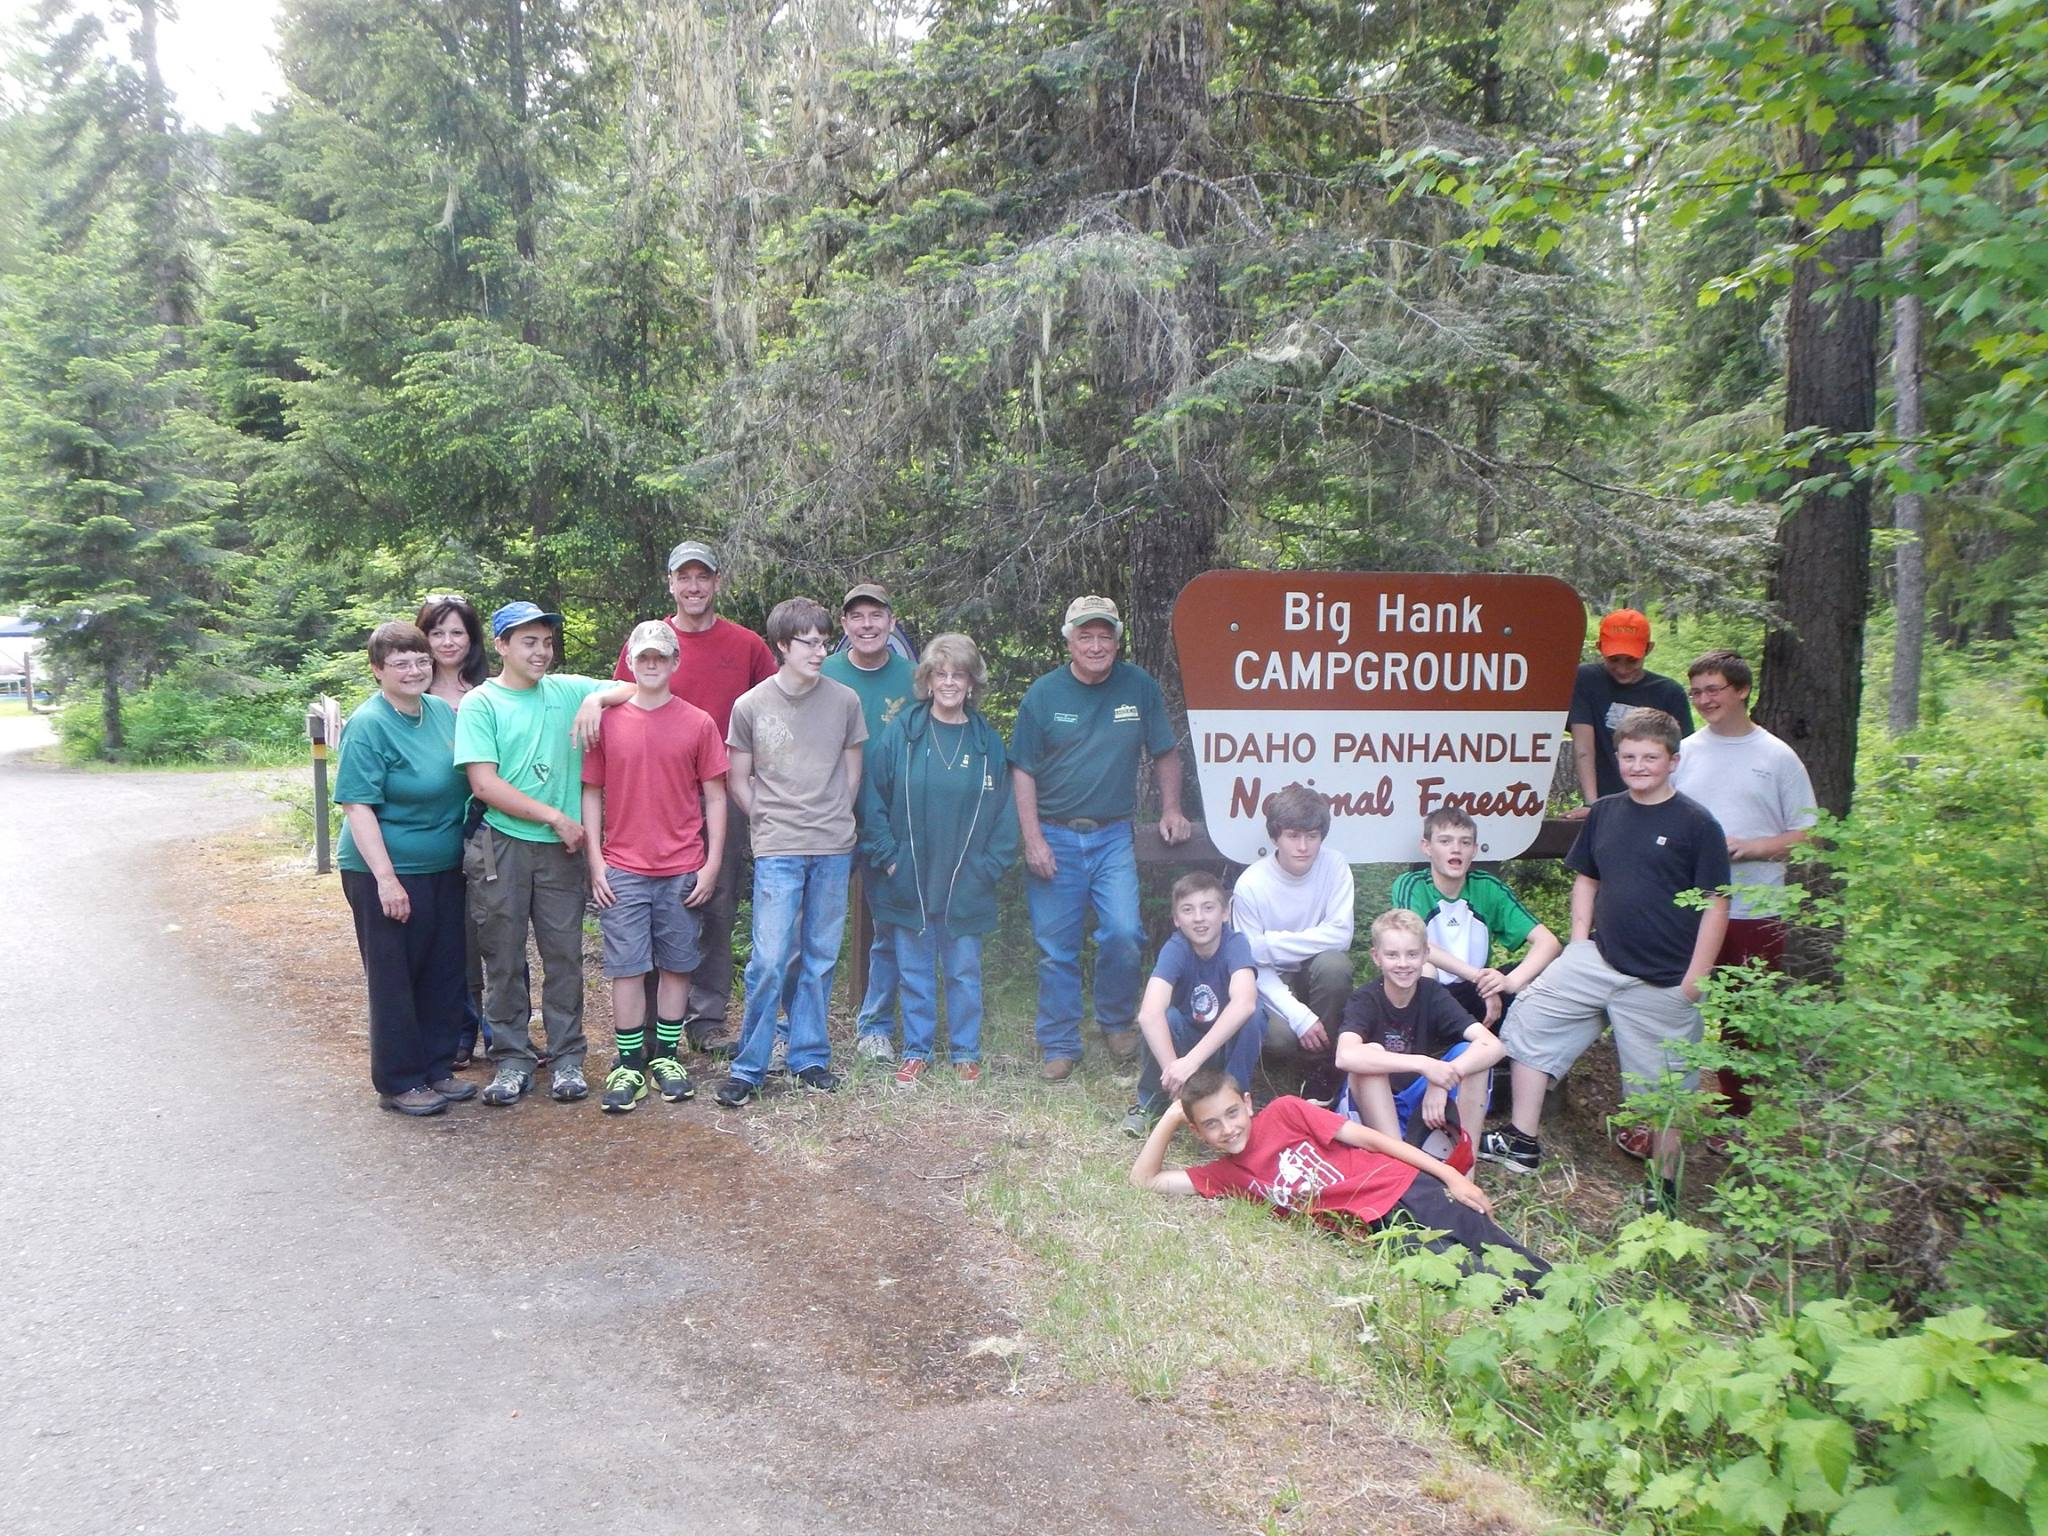 Spokane, Washington, Boy Scout Troop 313 - Big Hank Campground with hosts Al Hilyer and Darlene Muir